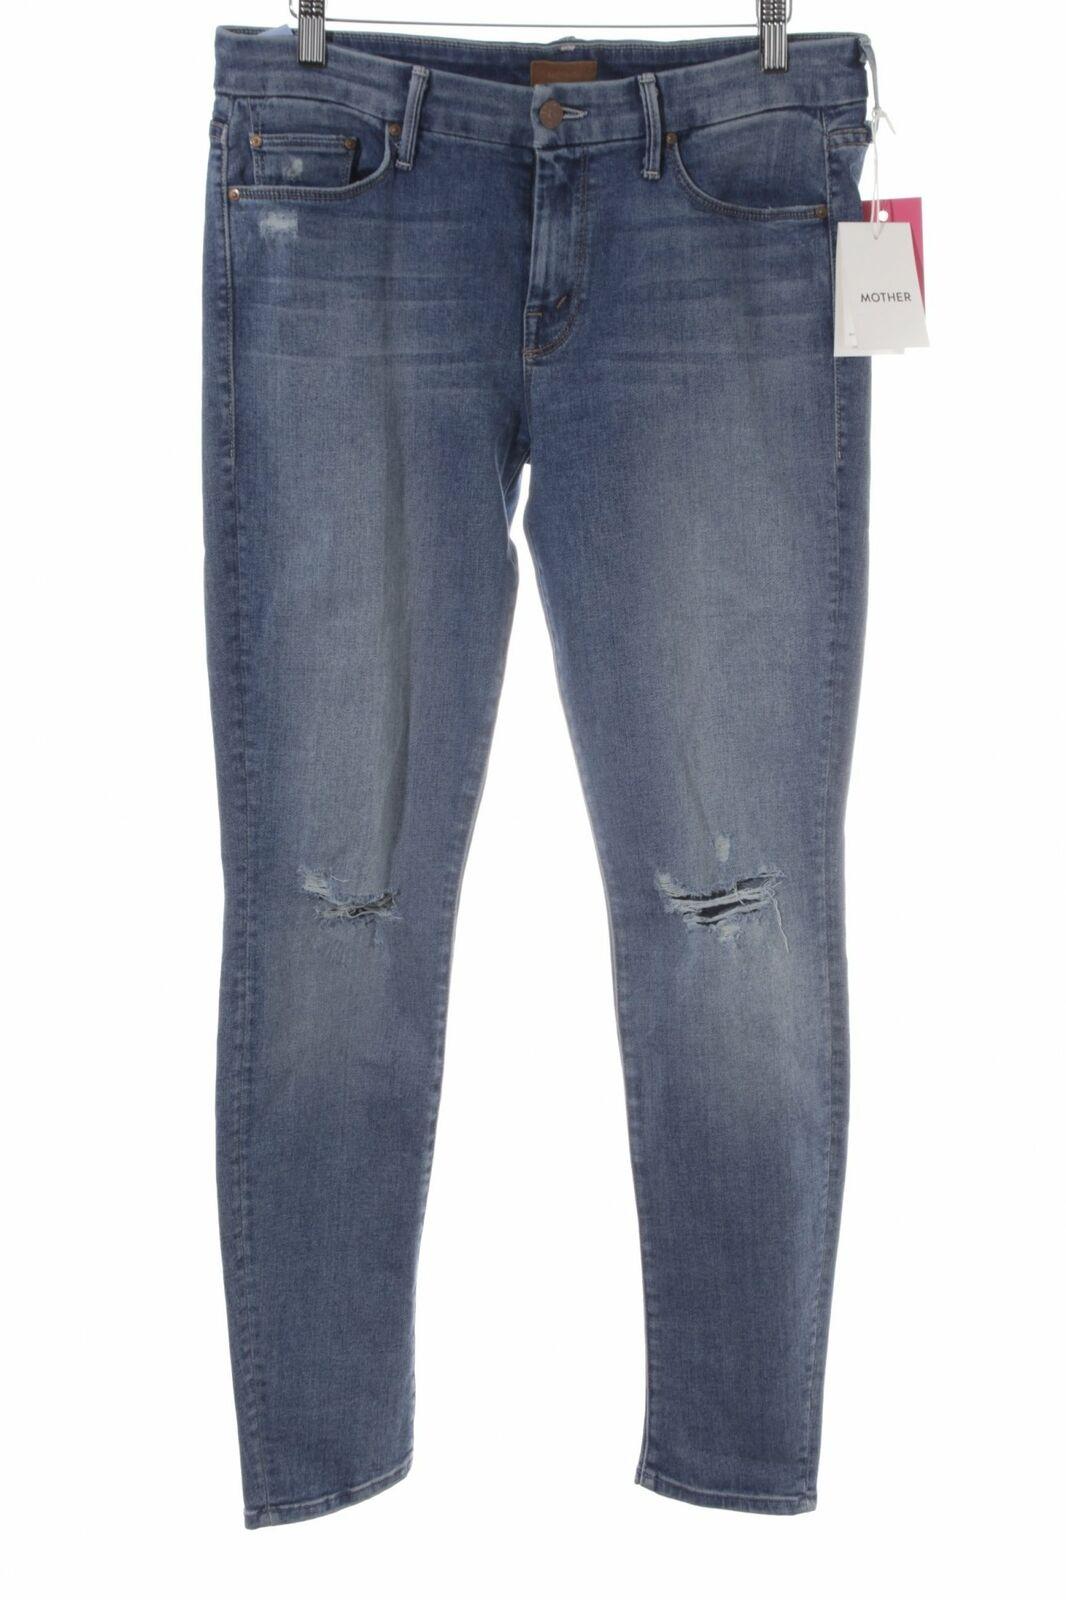 MOTHER Röhrenjeans stahlblau Boyfriend-Look Damen Gr. DE 36 Jeans Tube Jeans